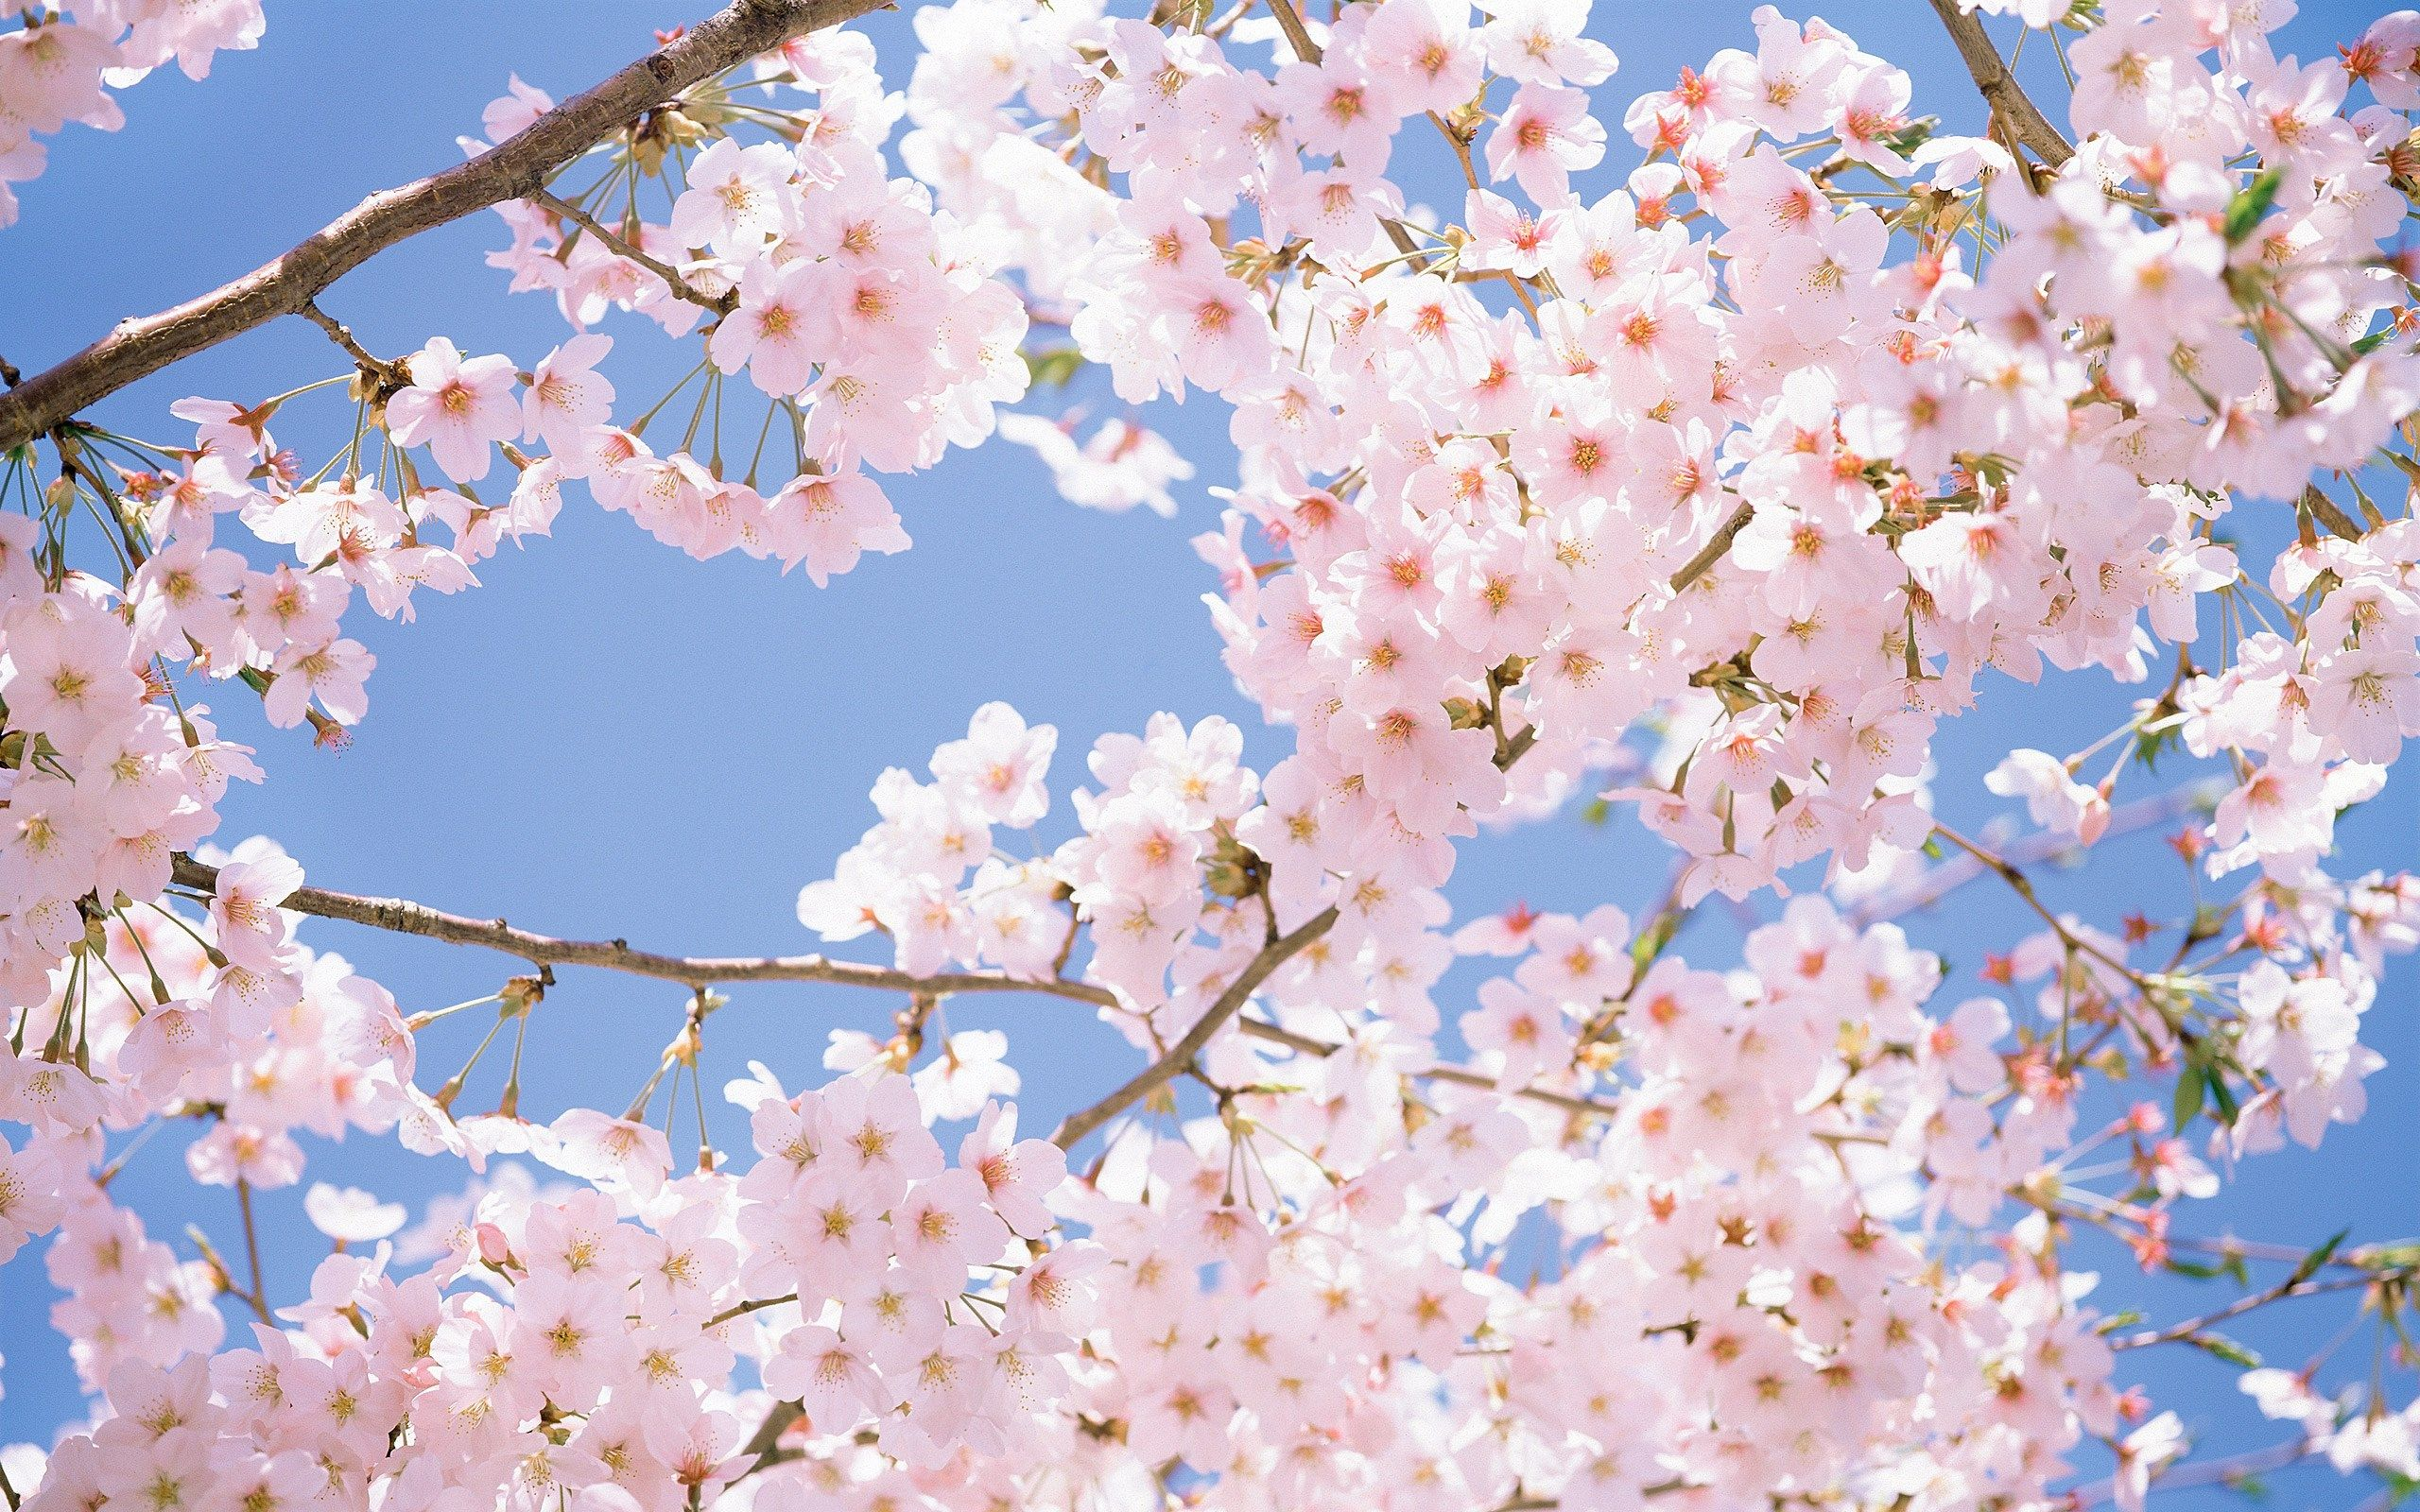 Flowers Wallpaper White Cherry Blossoms Wallpapers Desktop Cherry Blossom Wallpaper Apple Blossom Flower Flower Wallpaper